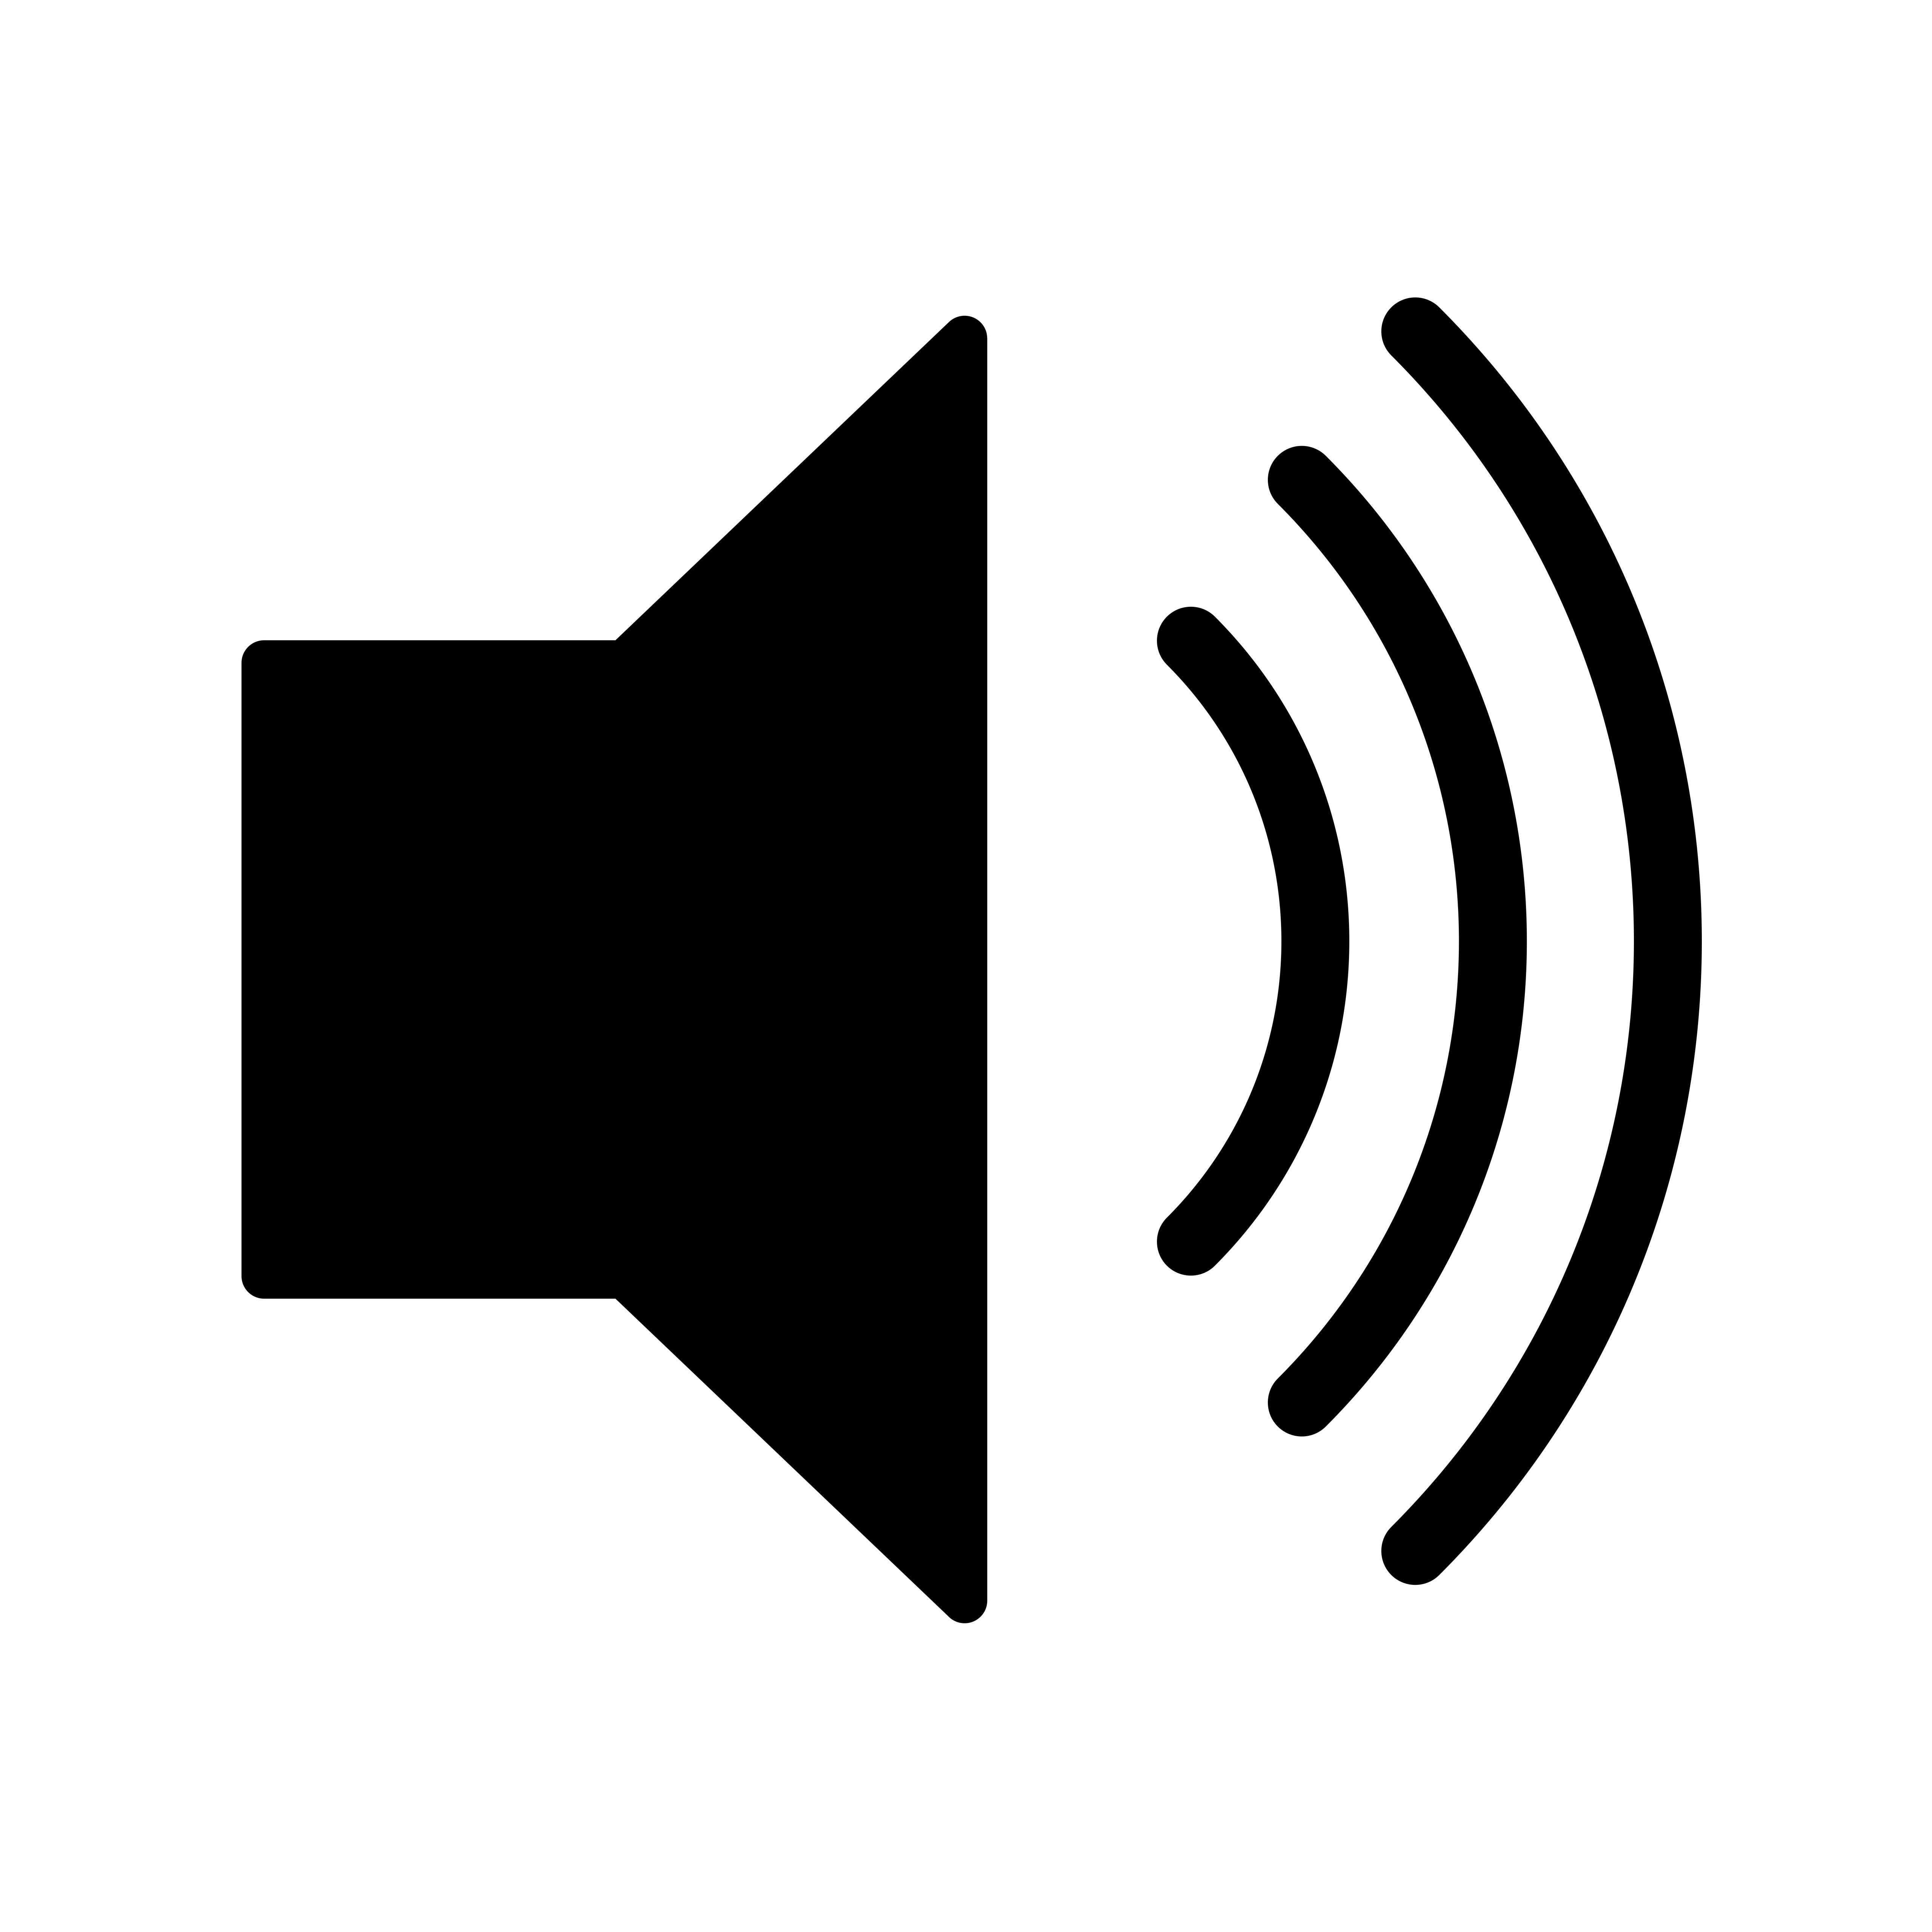 high Volume Vector Ico...